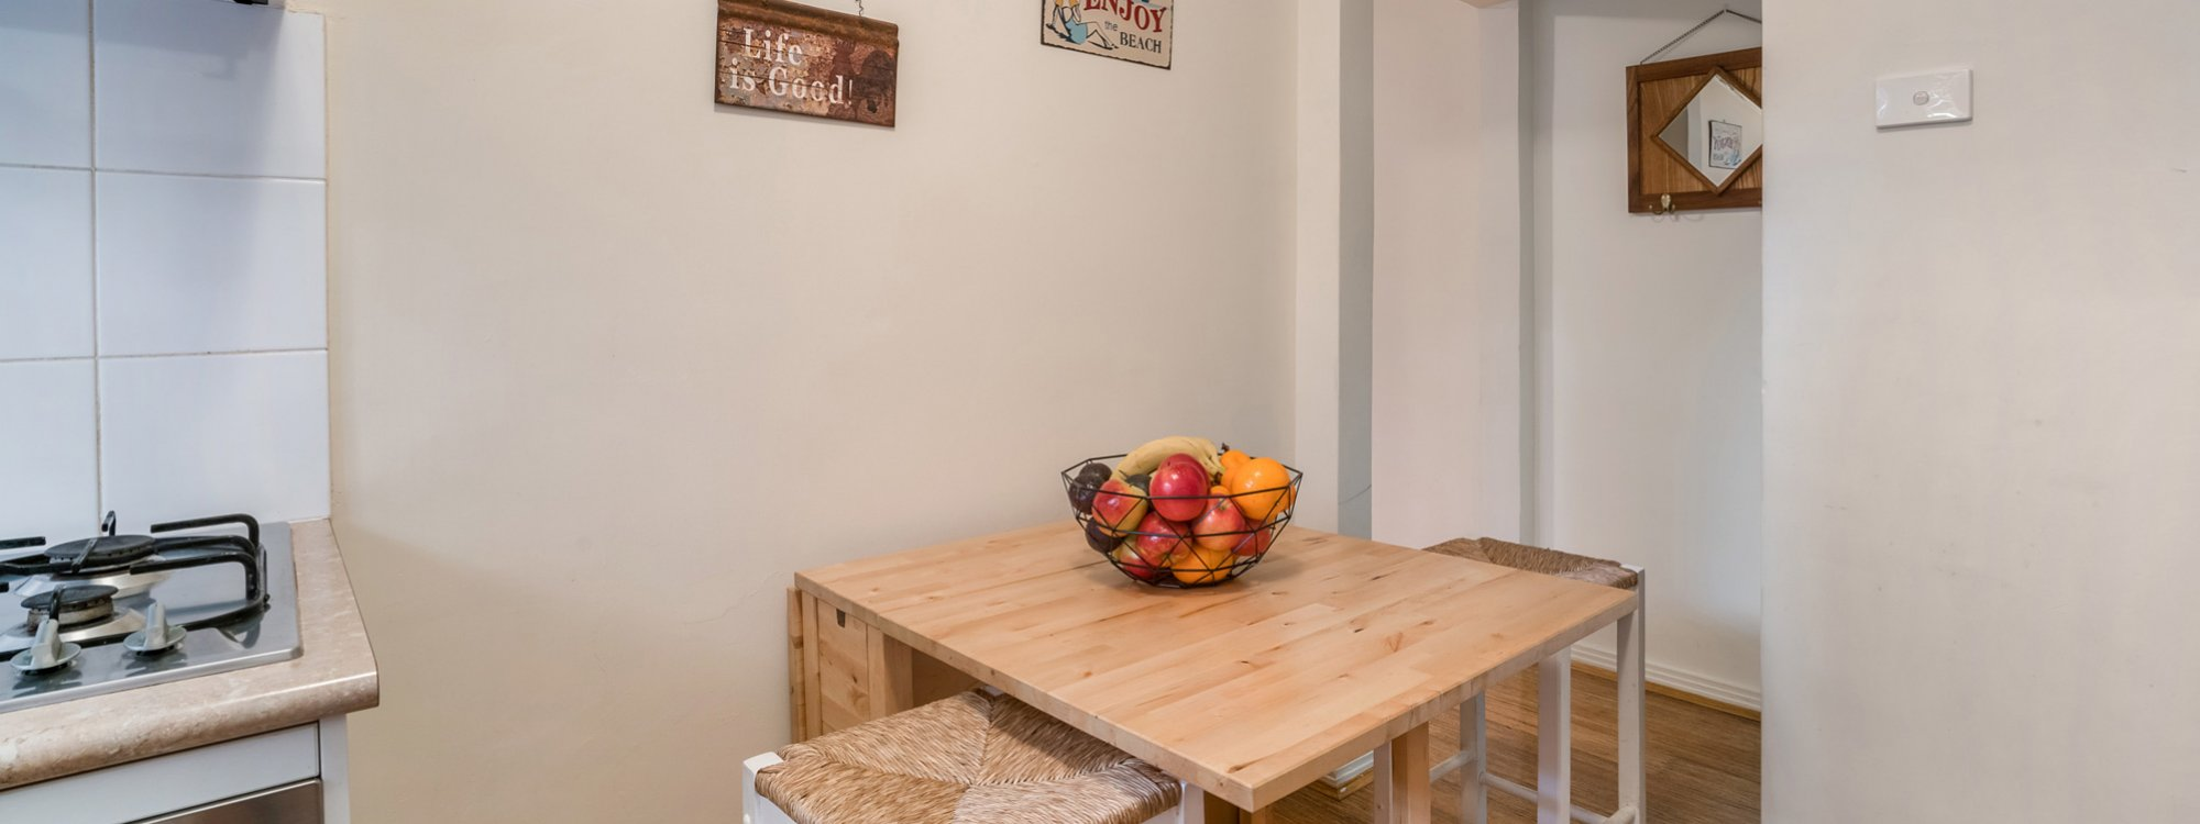 Bondi Beach Peach - Dining